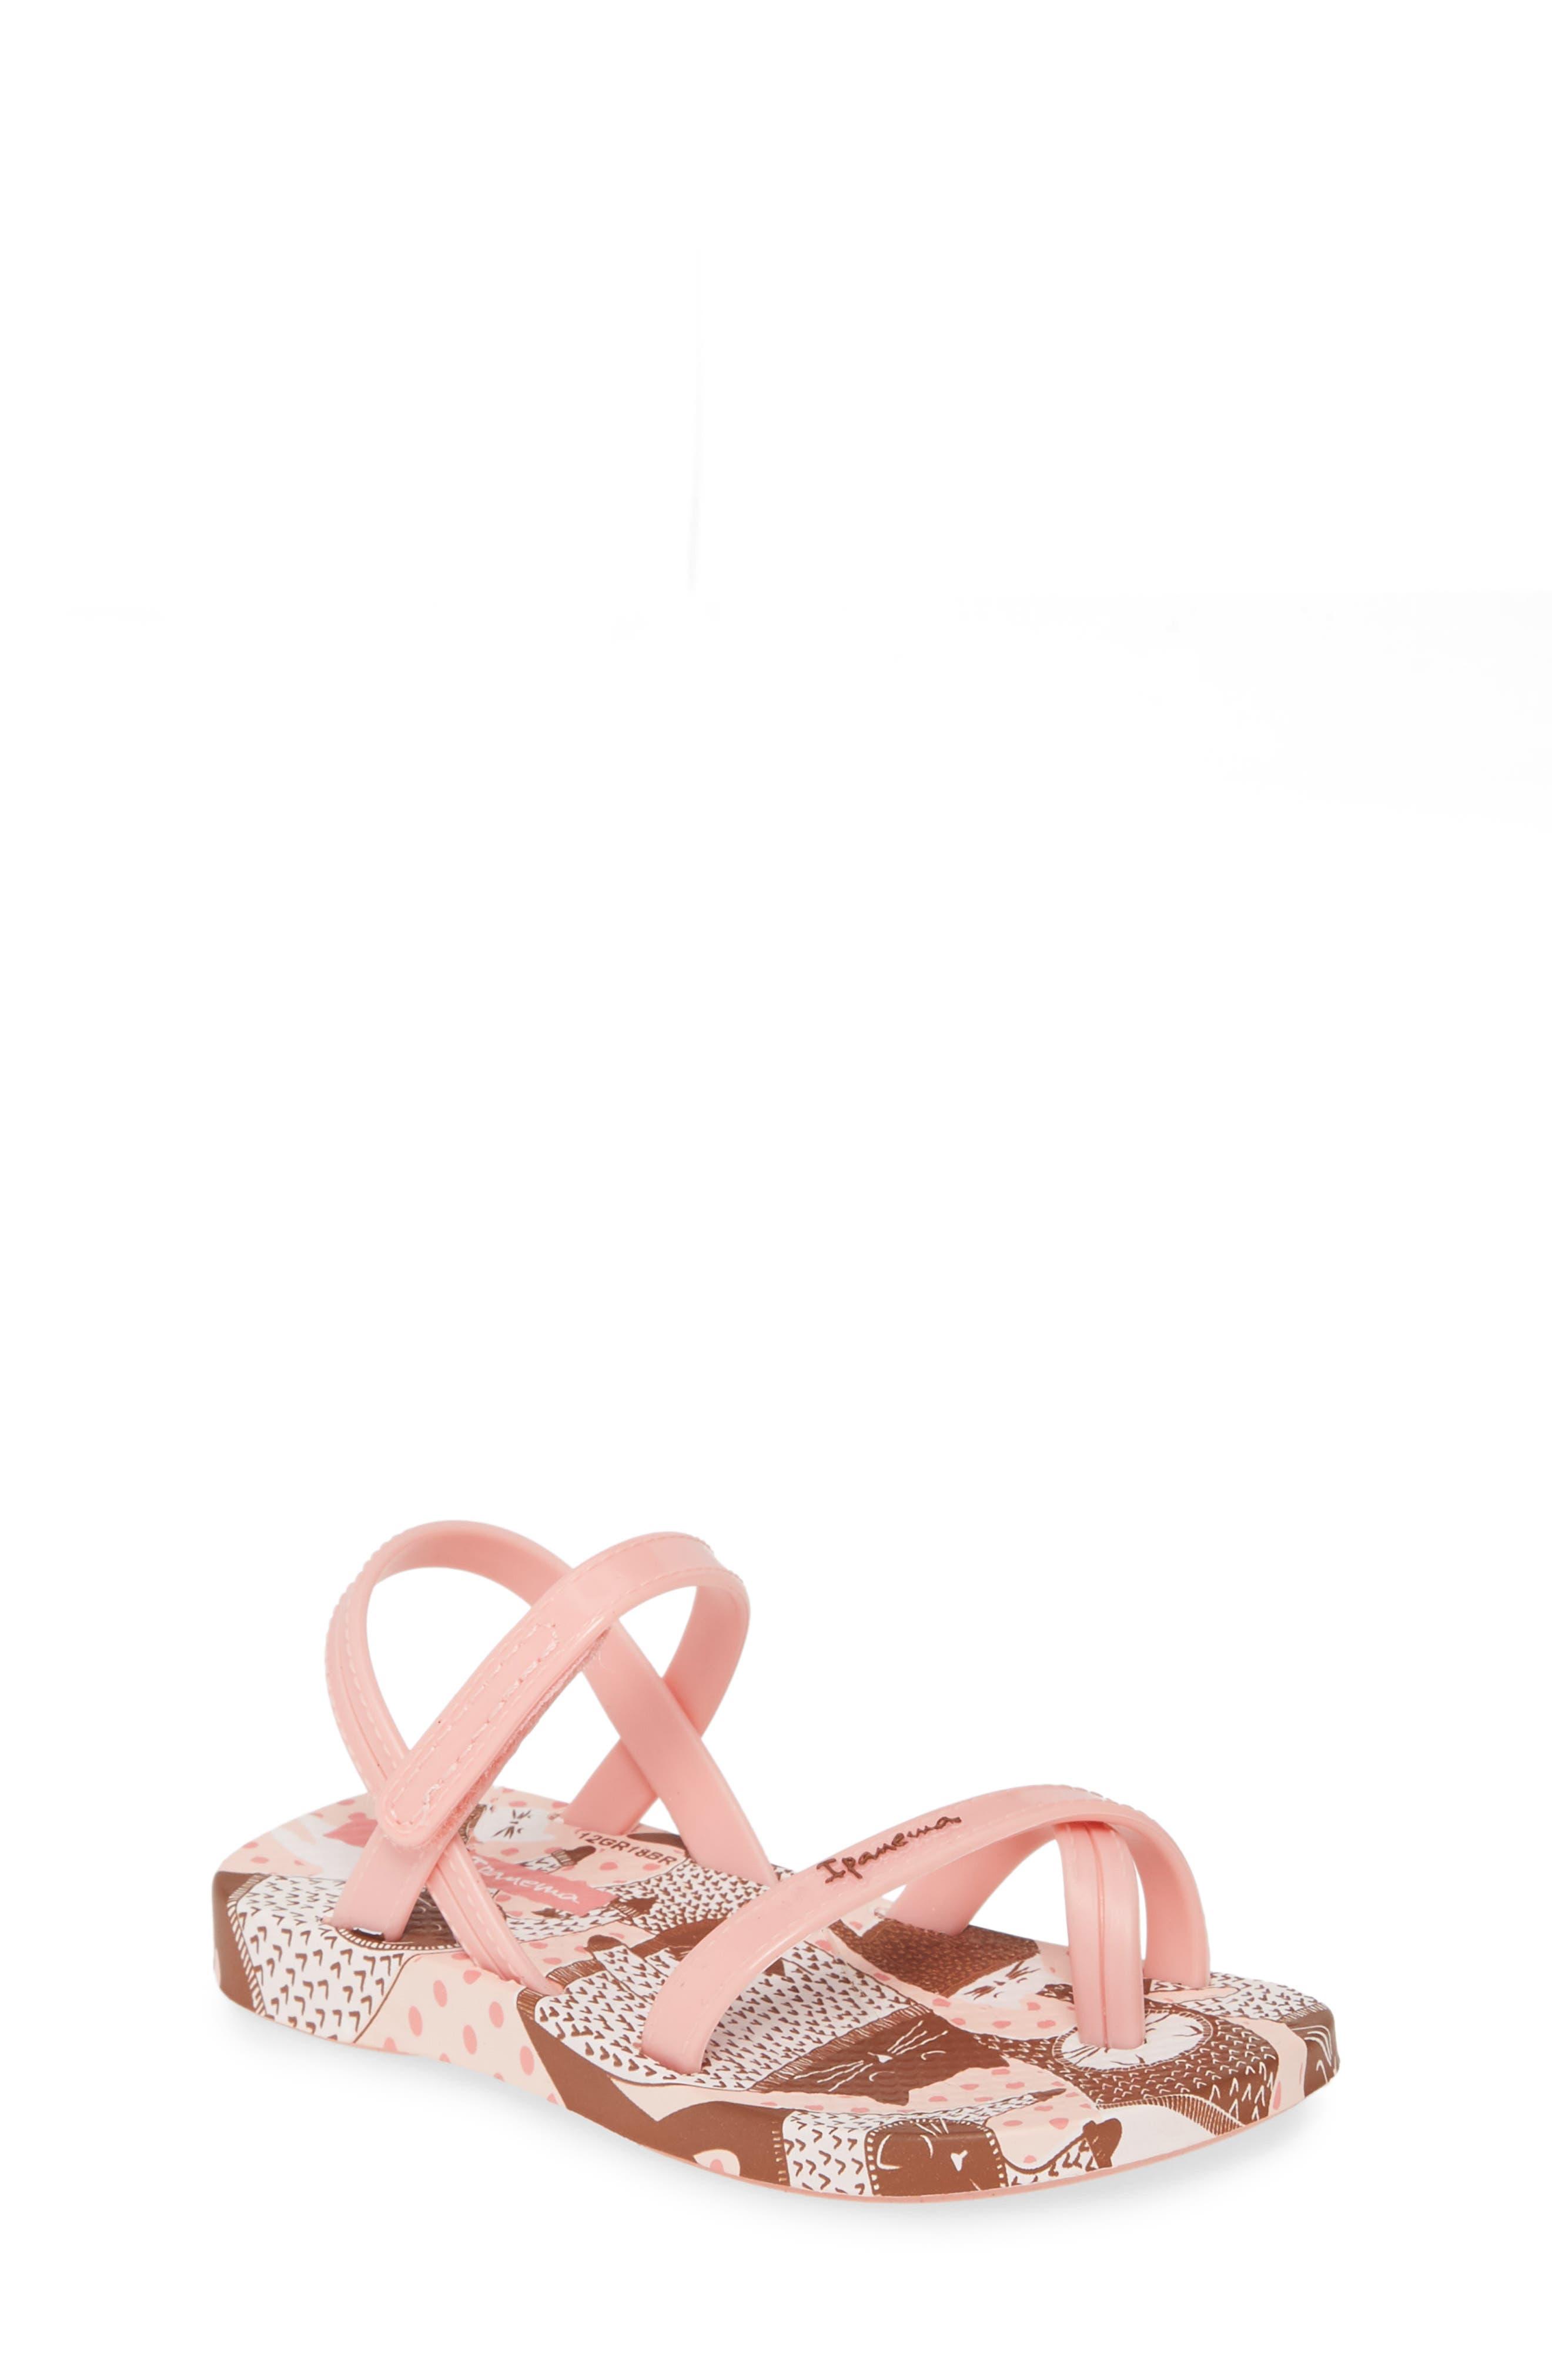 Toddler Girls Ipanema Suzi Print Sandal Size 5 M  Pink